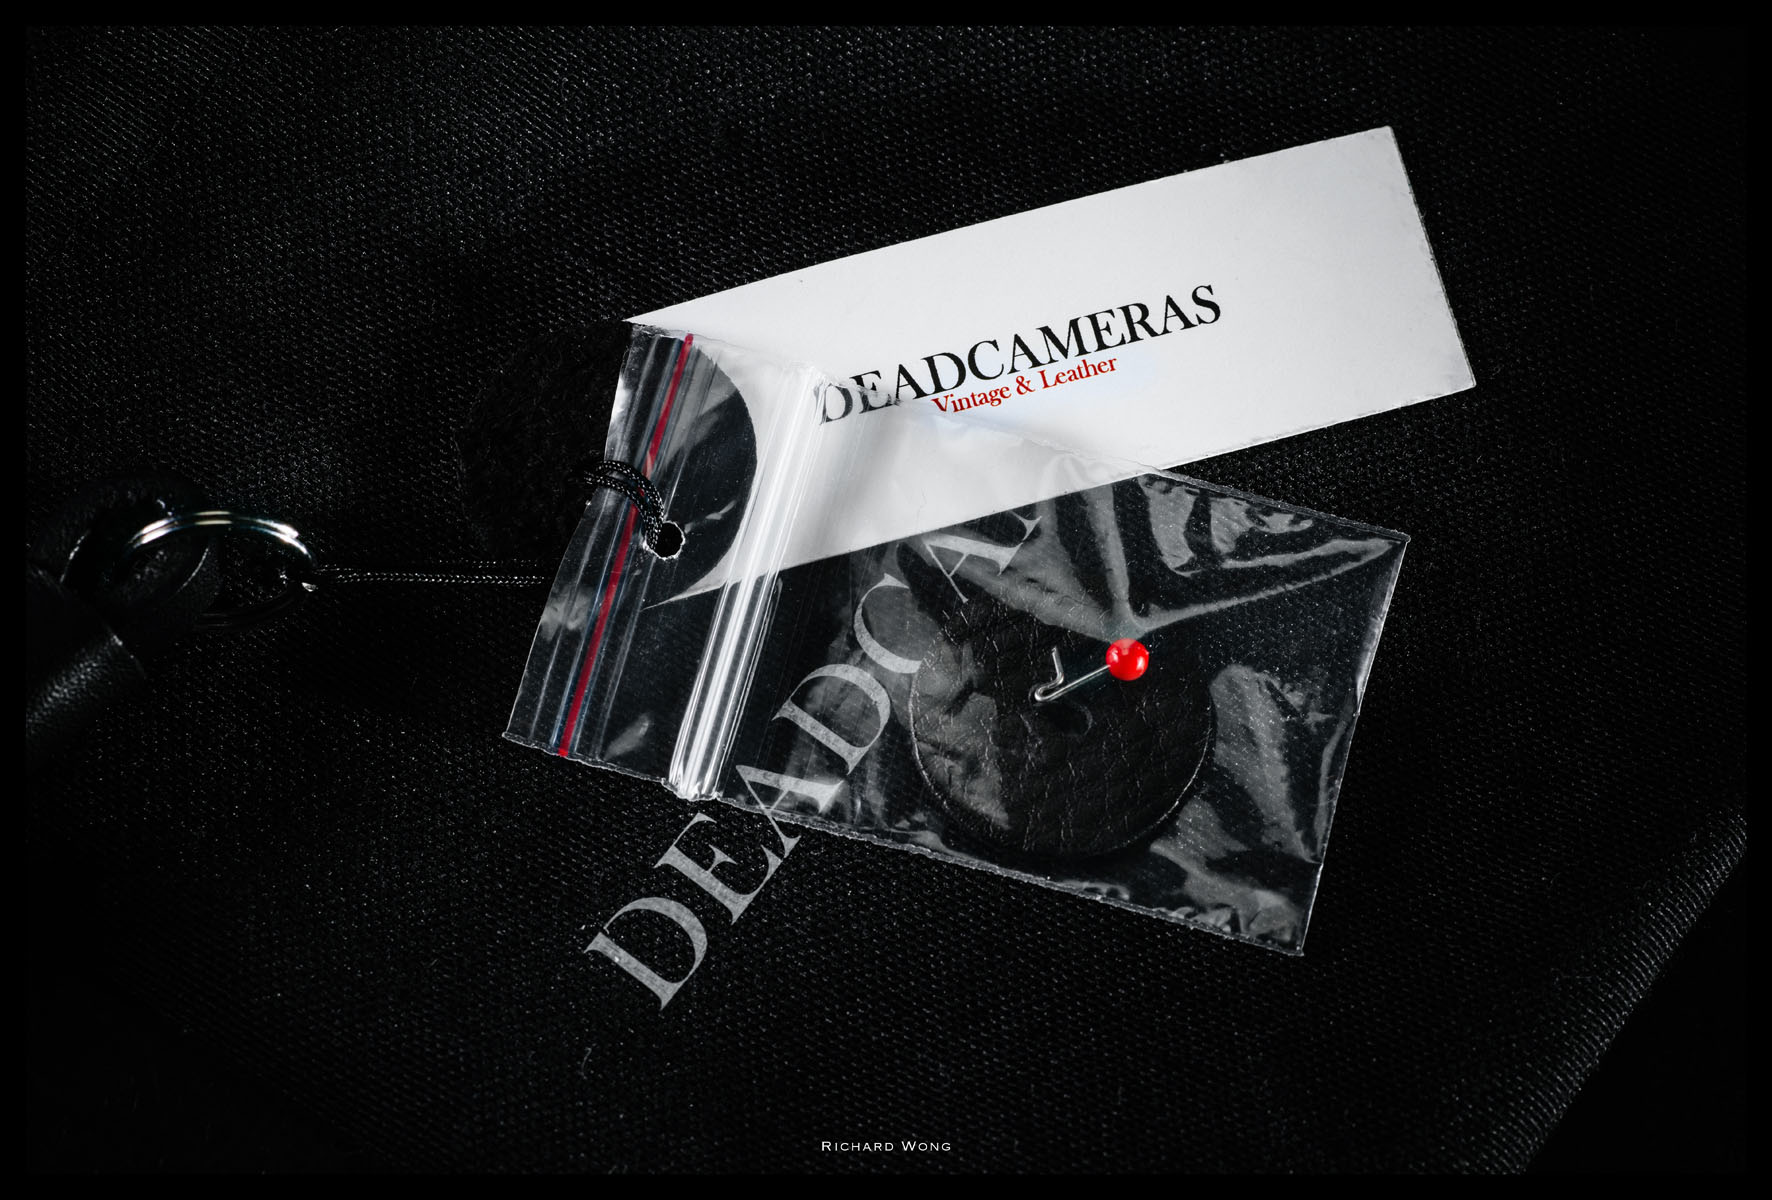 Deadcameras-strap-review-03